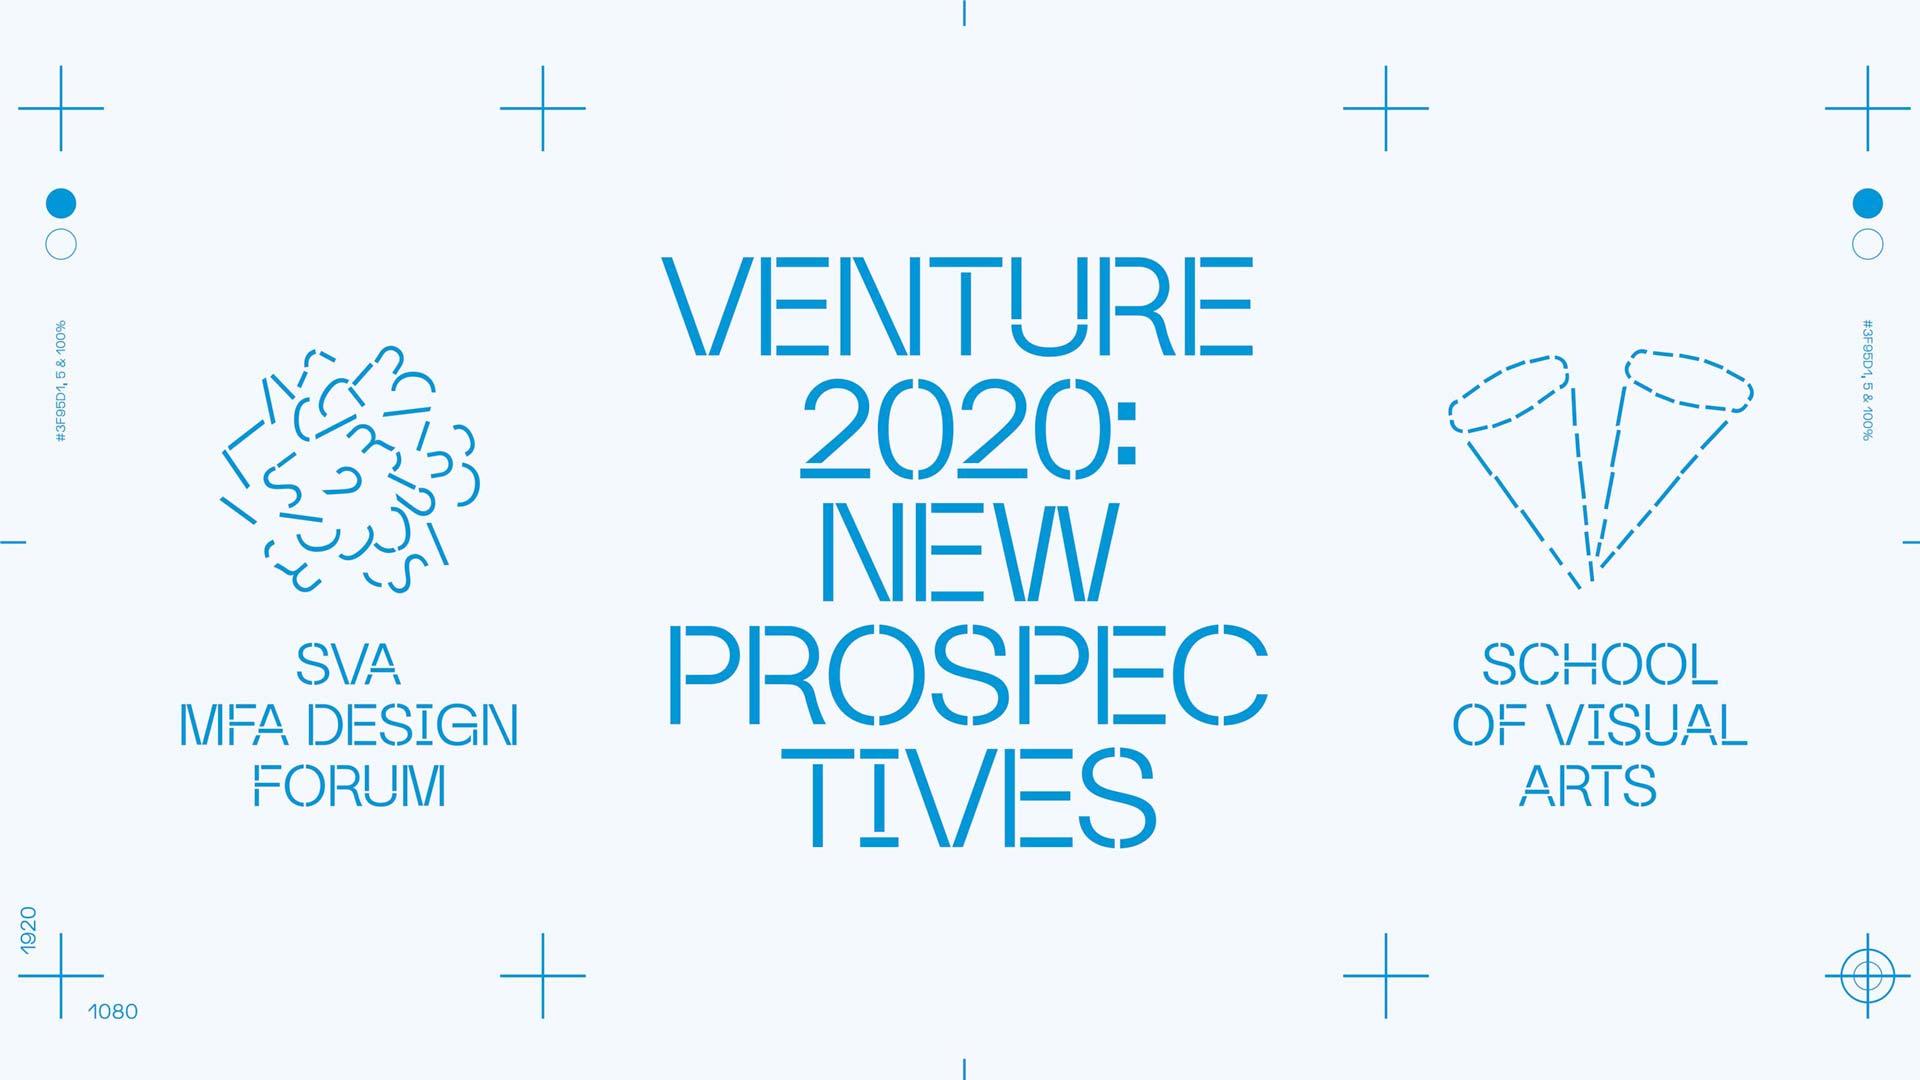 Venture 2020 banner